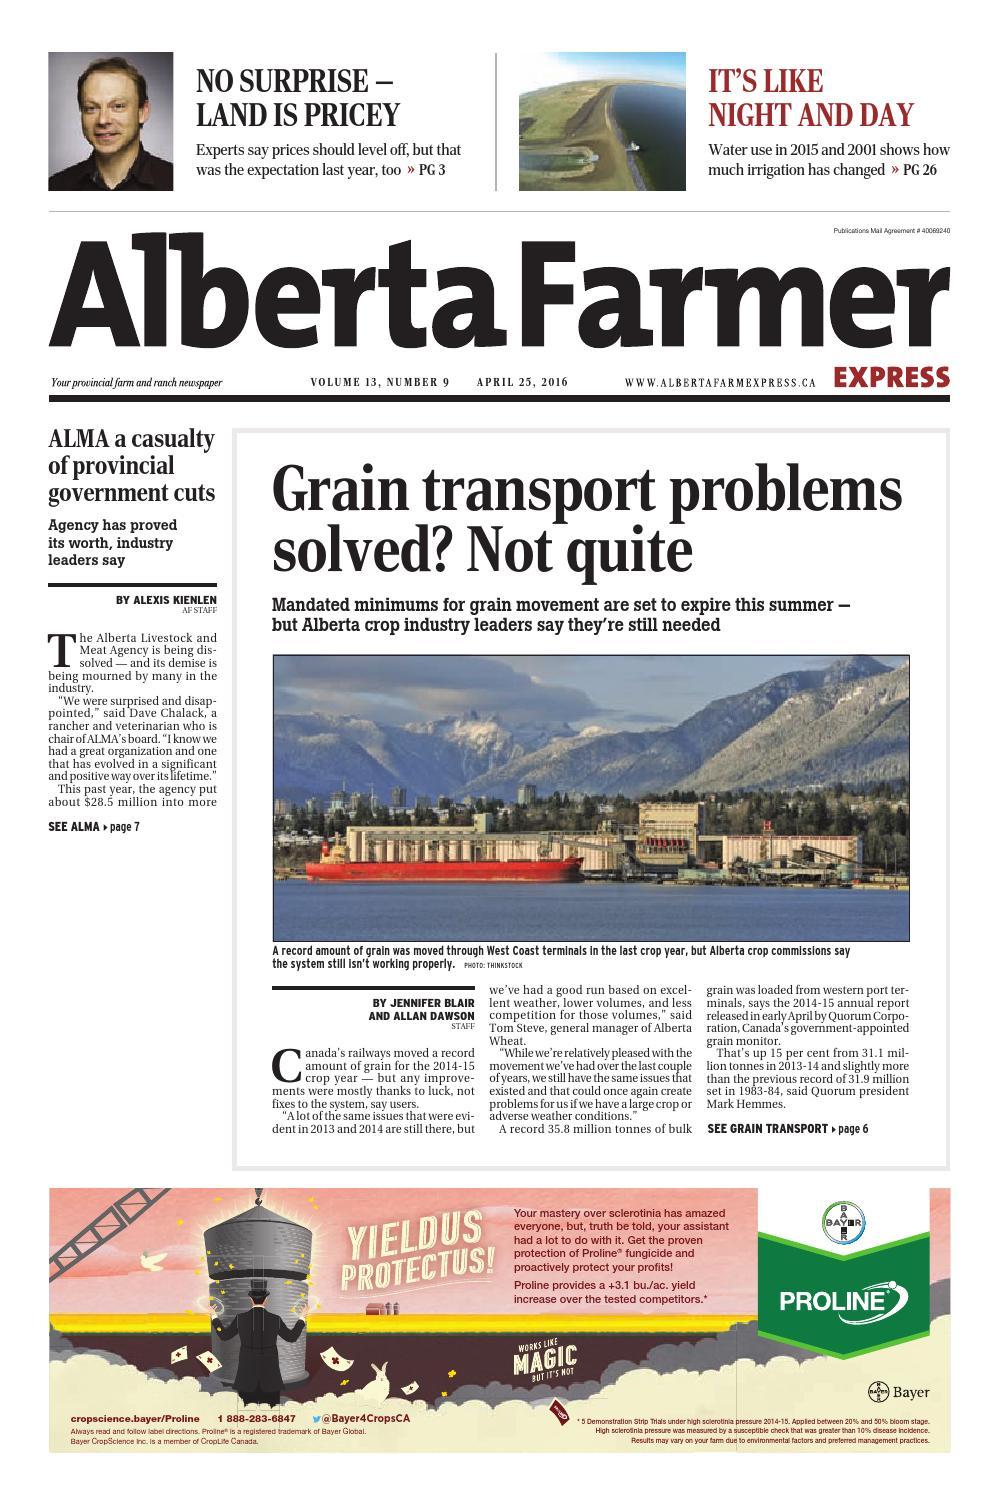 Alberta farmer express by Farm Business Communications - issuu